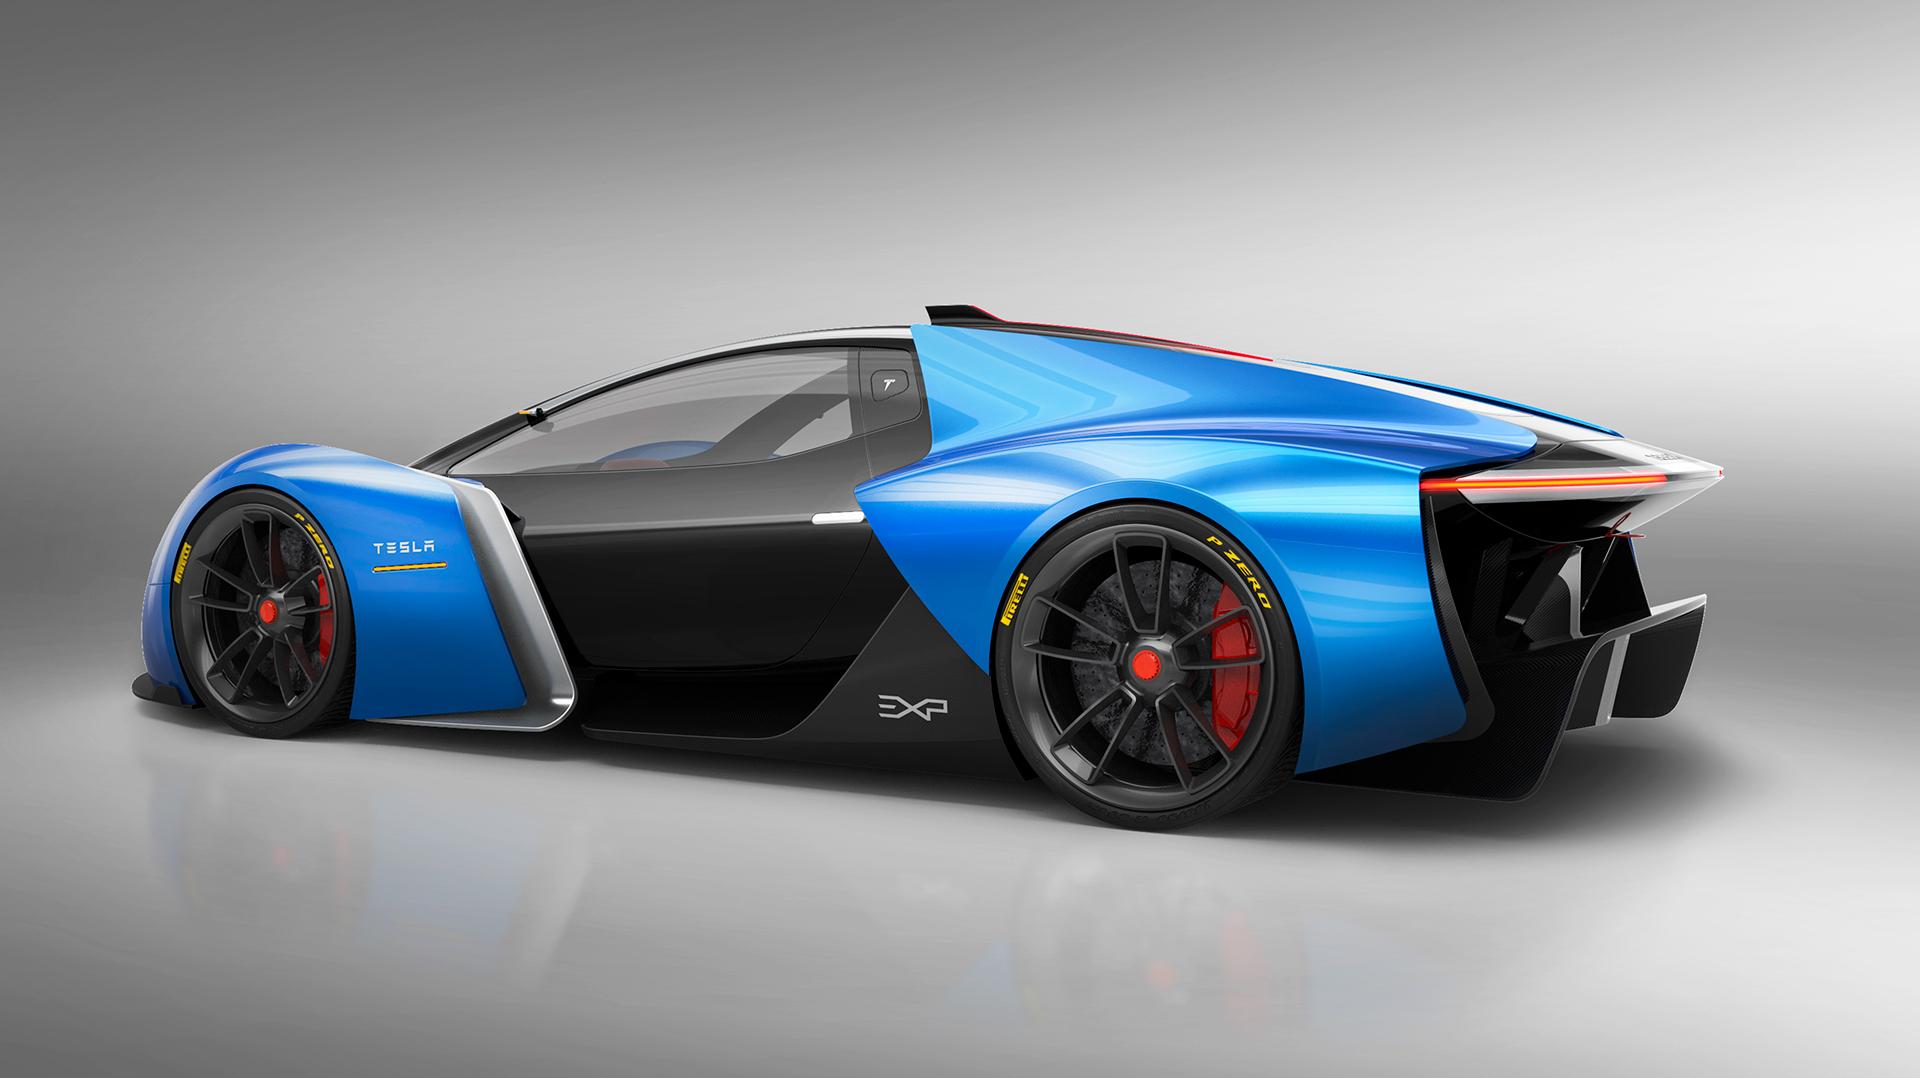 Designer's vision of an Electric Supercar the 'Tesla Model ...